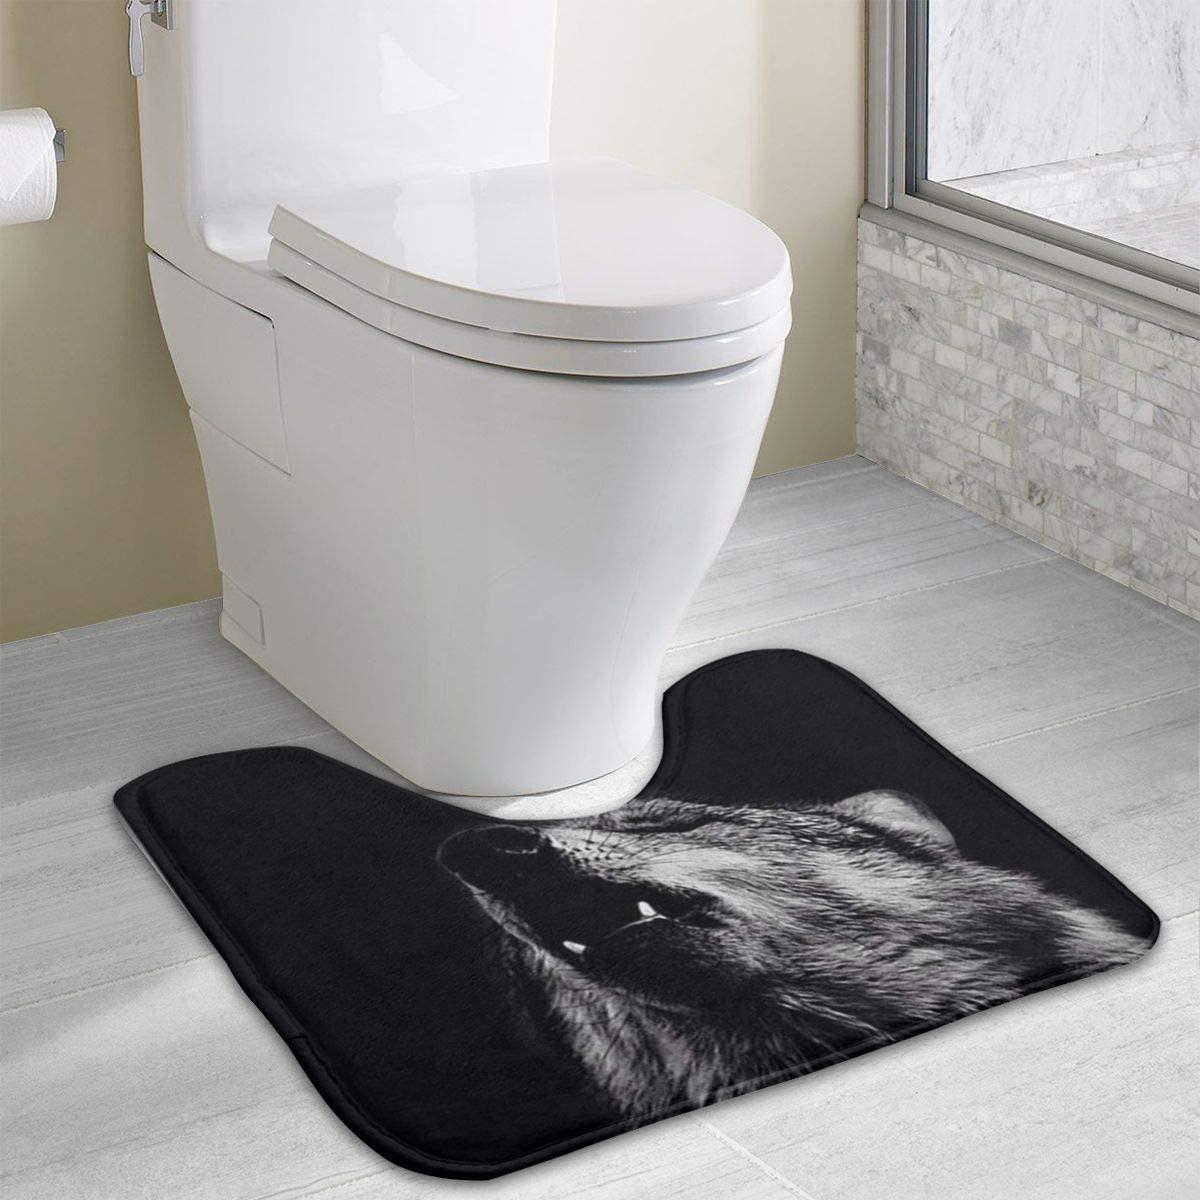 Bathroom Rug, Wolf U-Shaped Non Slip Absorbent Toilet Bath Floor Contour Doormat Shower Mat Carpet 19.3 X 15.7 Inch